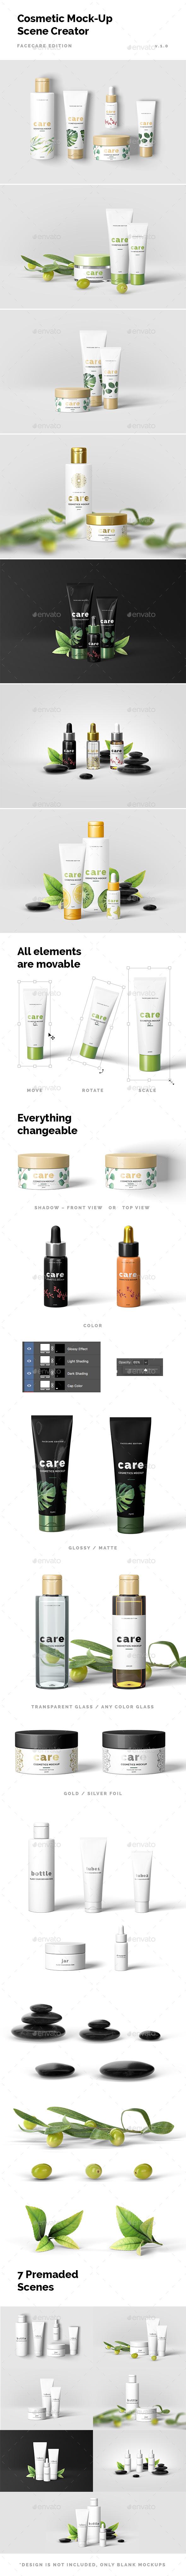 Cosmetic Mock-Up Scene Creator - Beauty Packaging